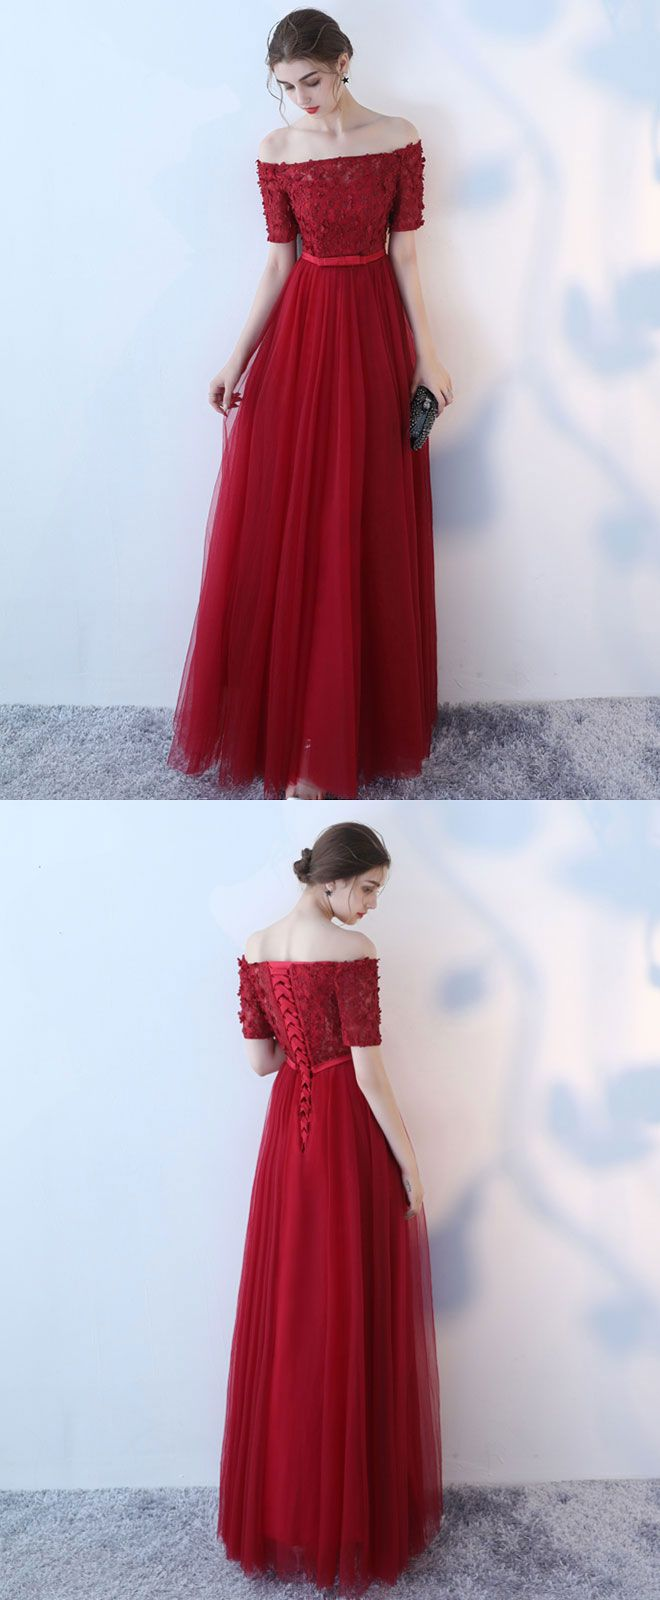 Burgundy tulle off shoulder long prom dress burgundy eveninng dress